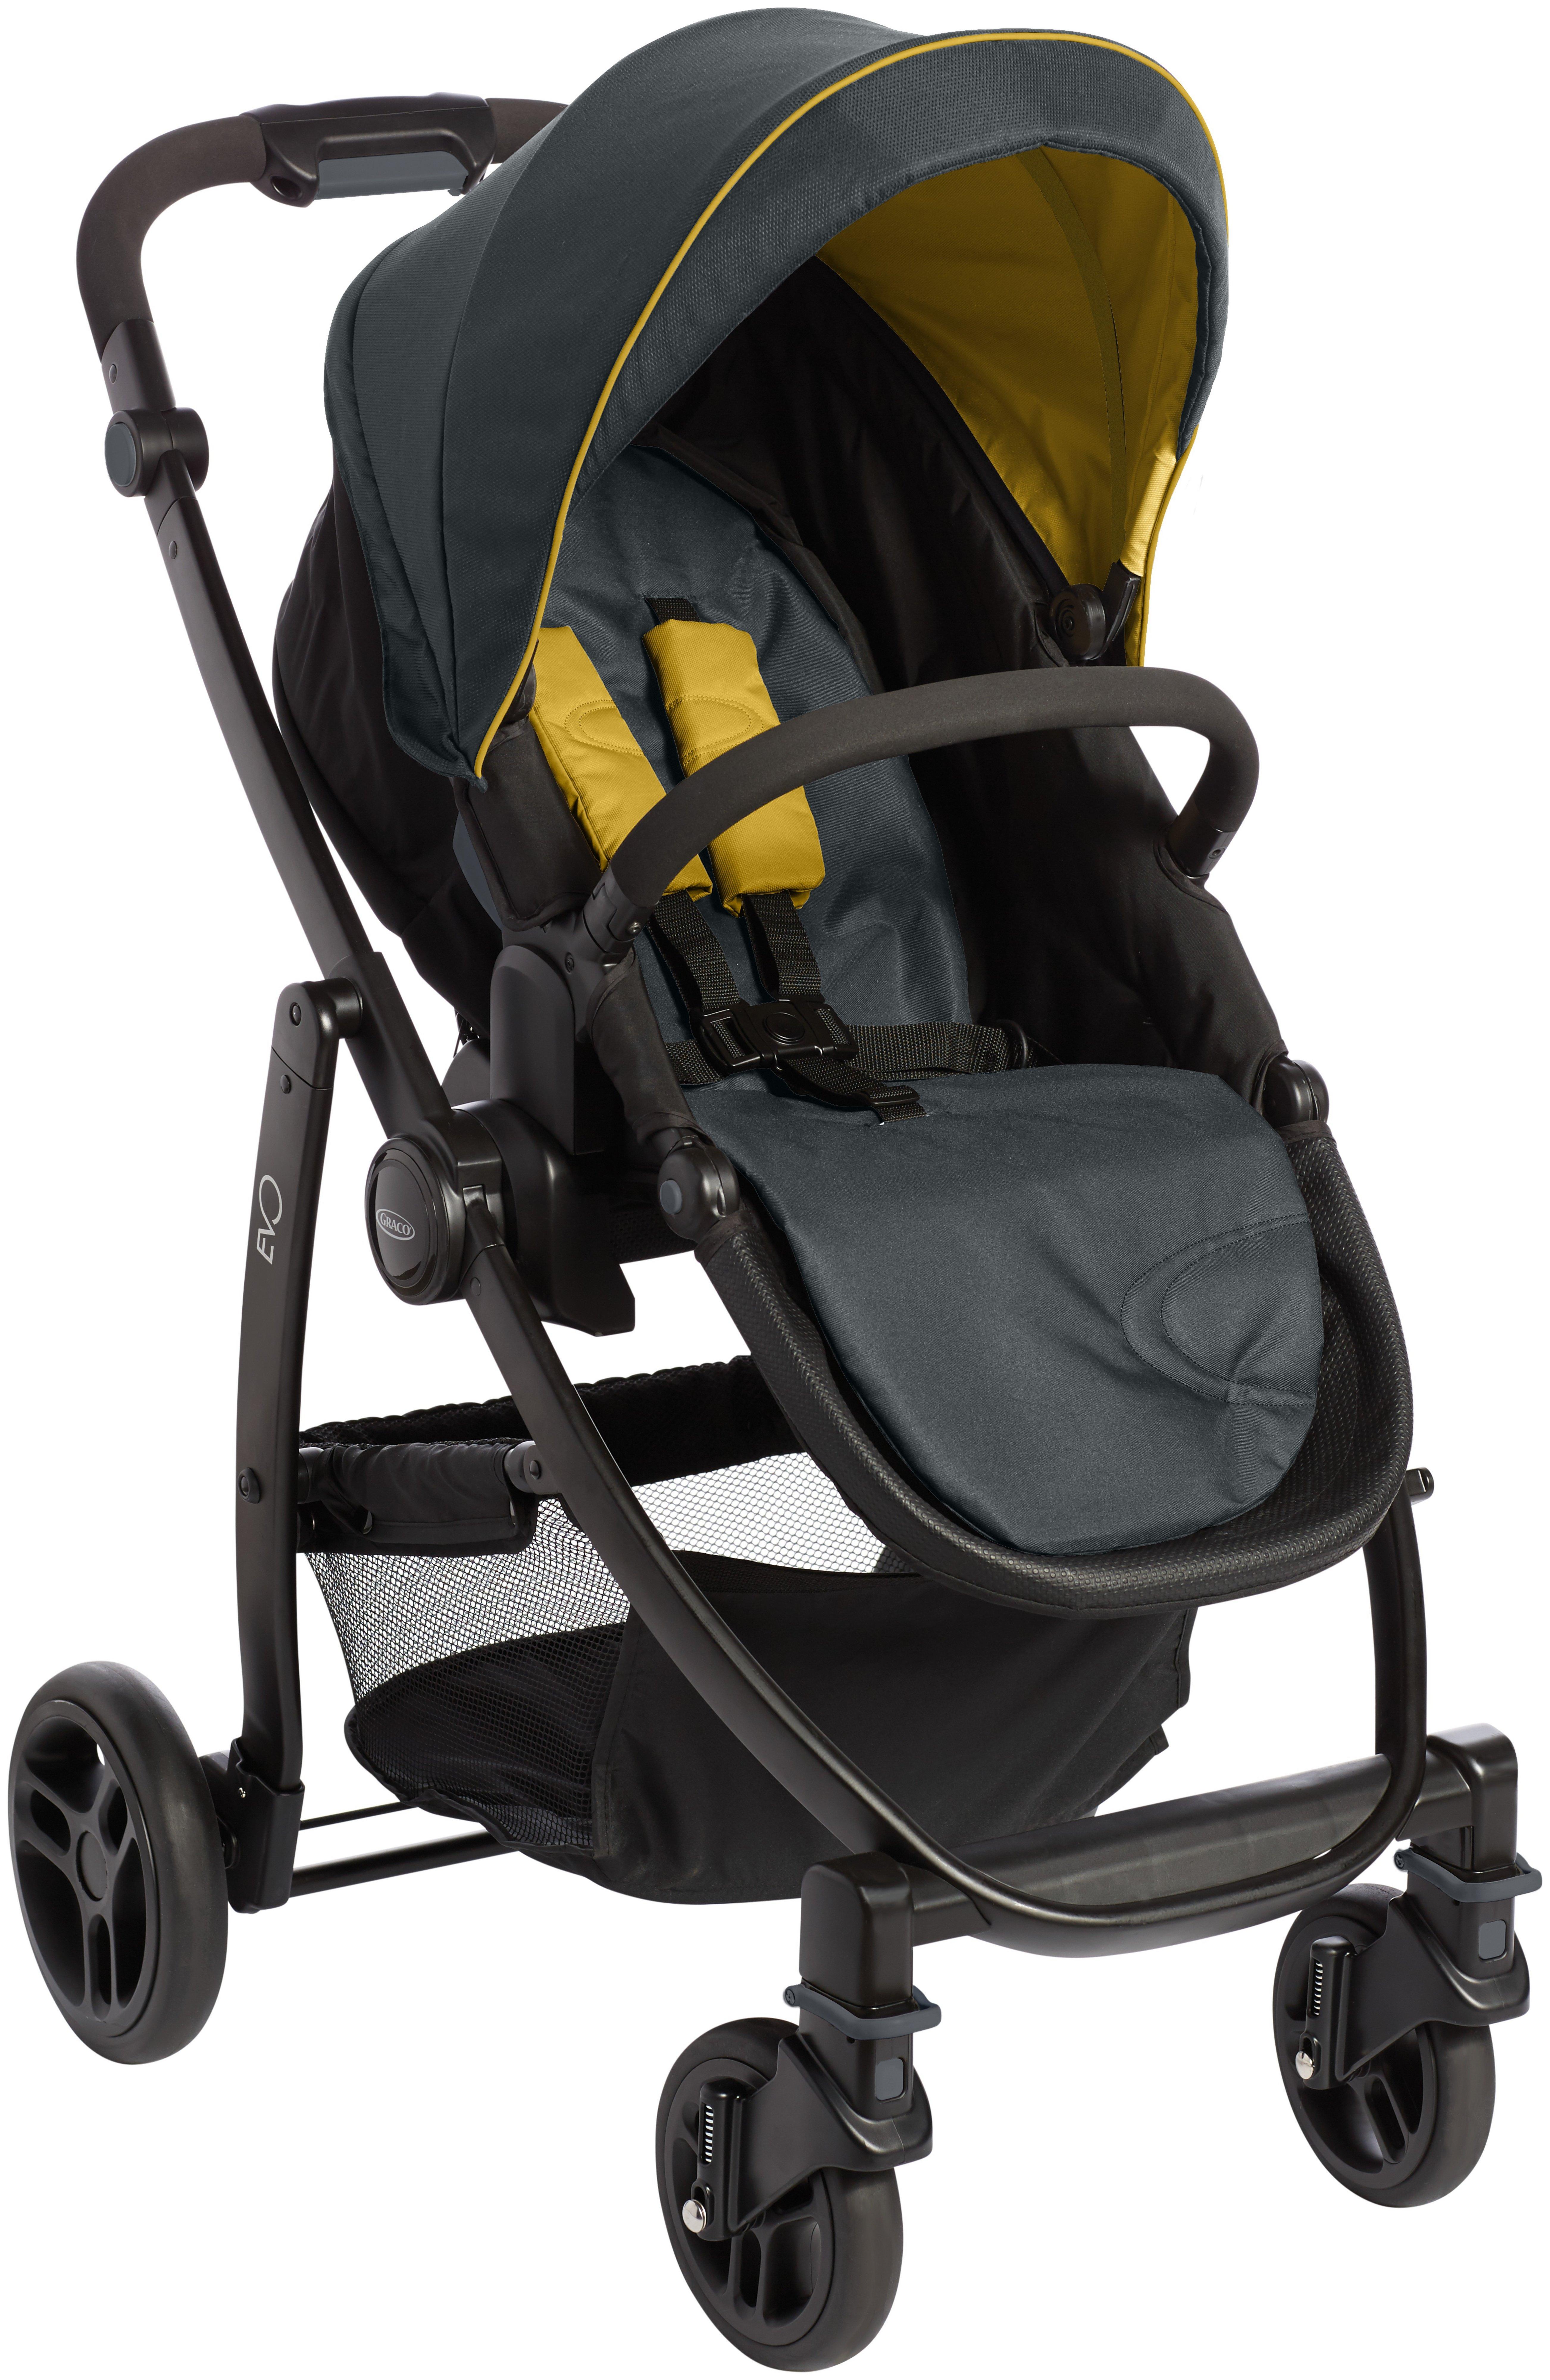 Image of Graco Evo Yellow TS Pushchair.